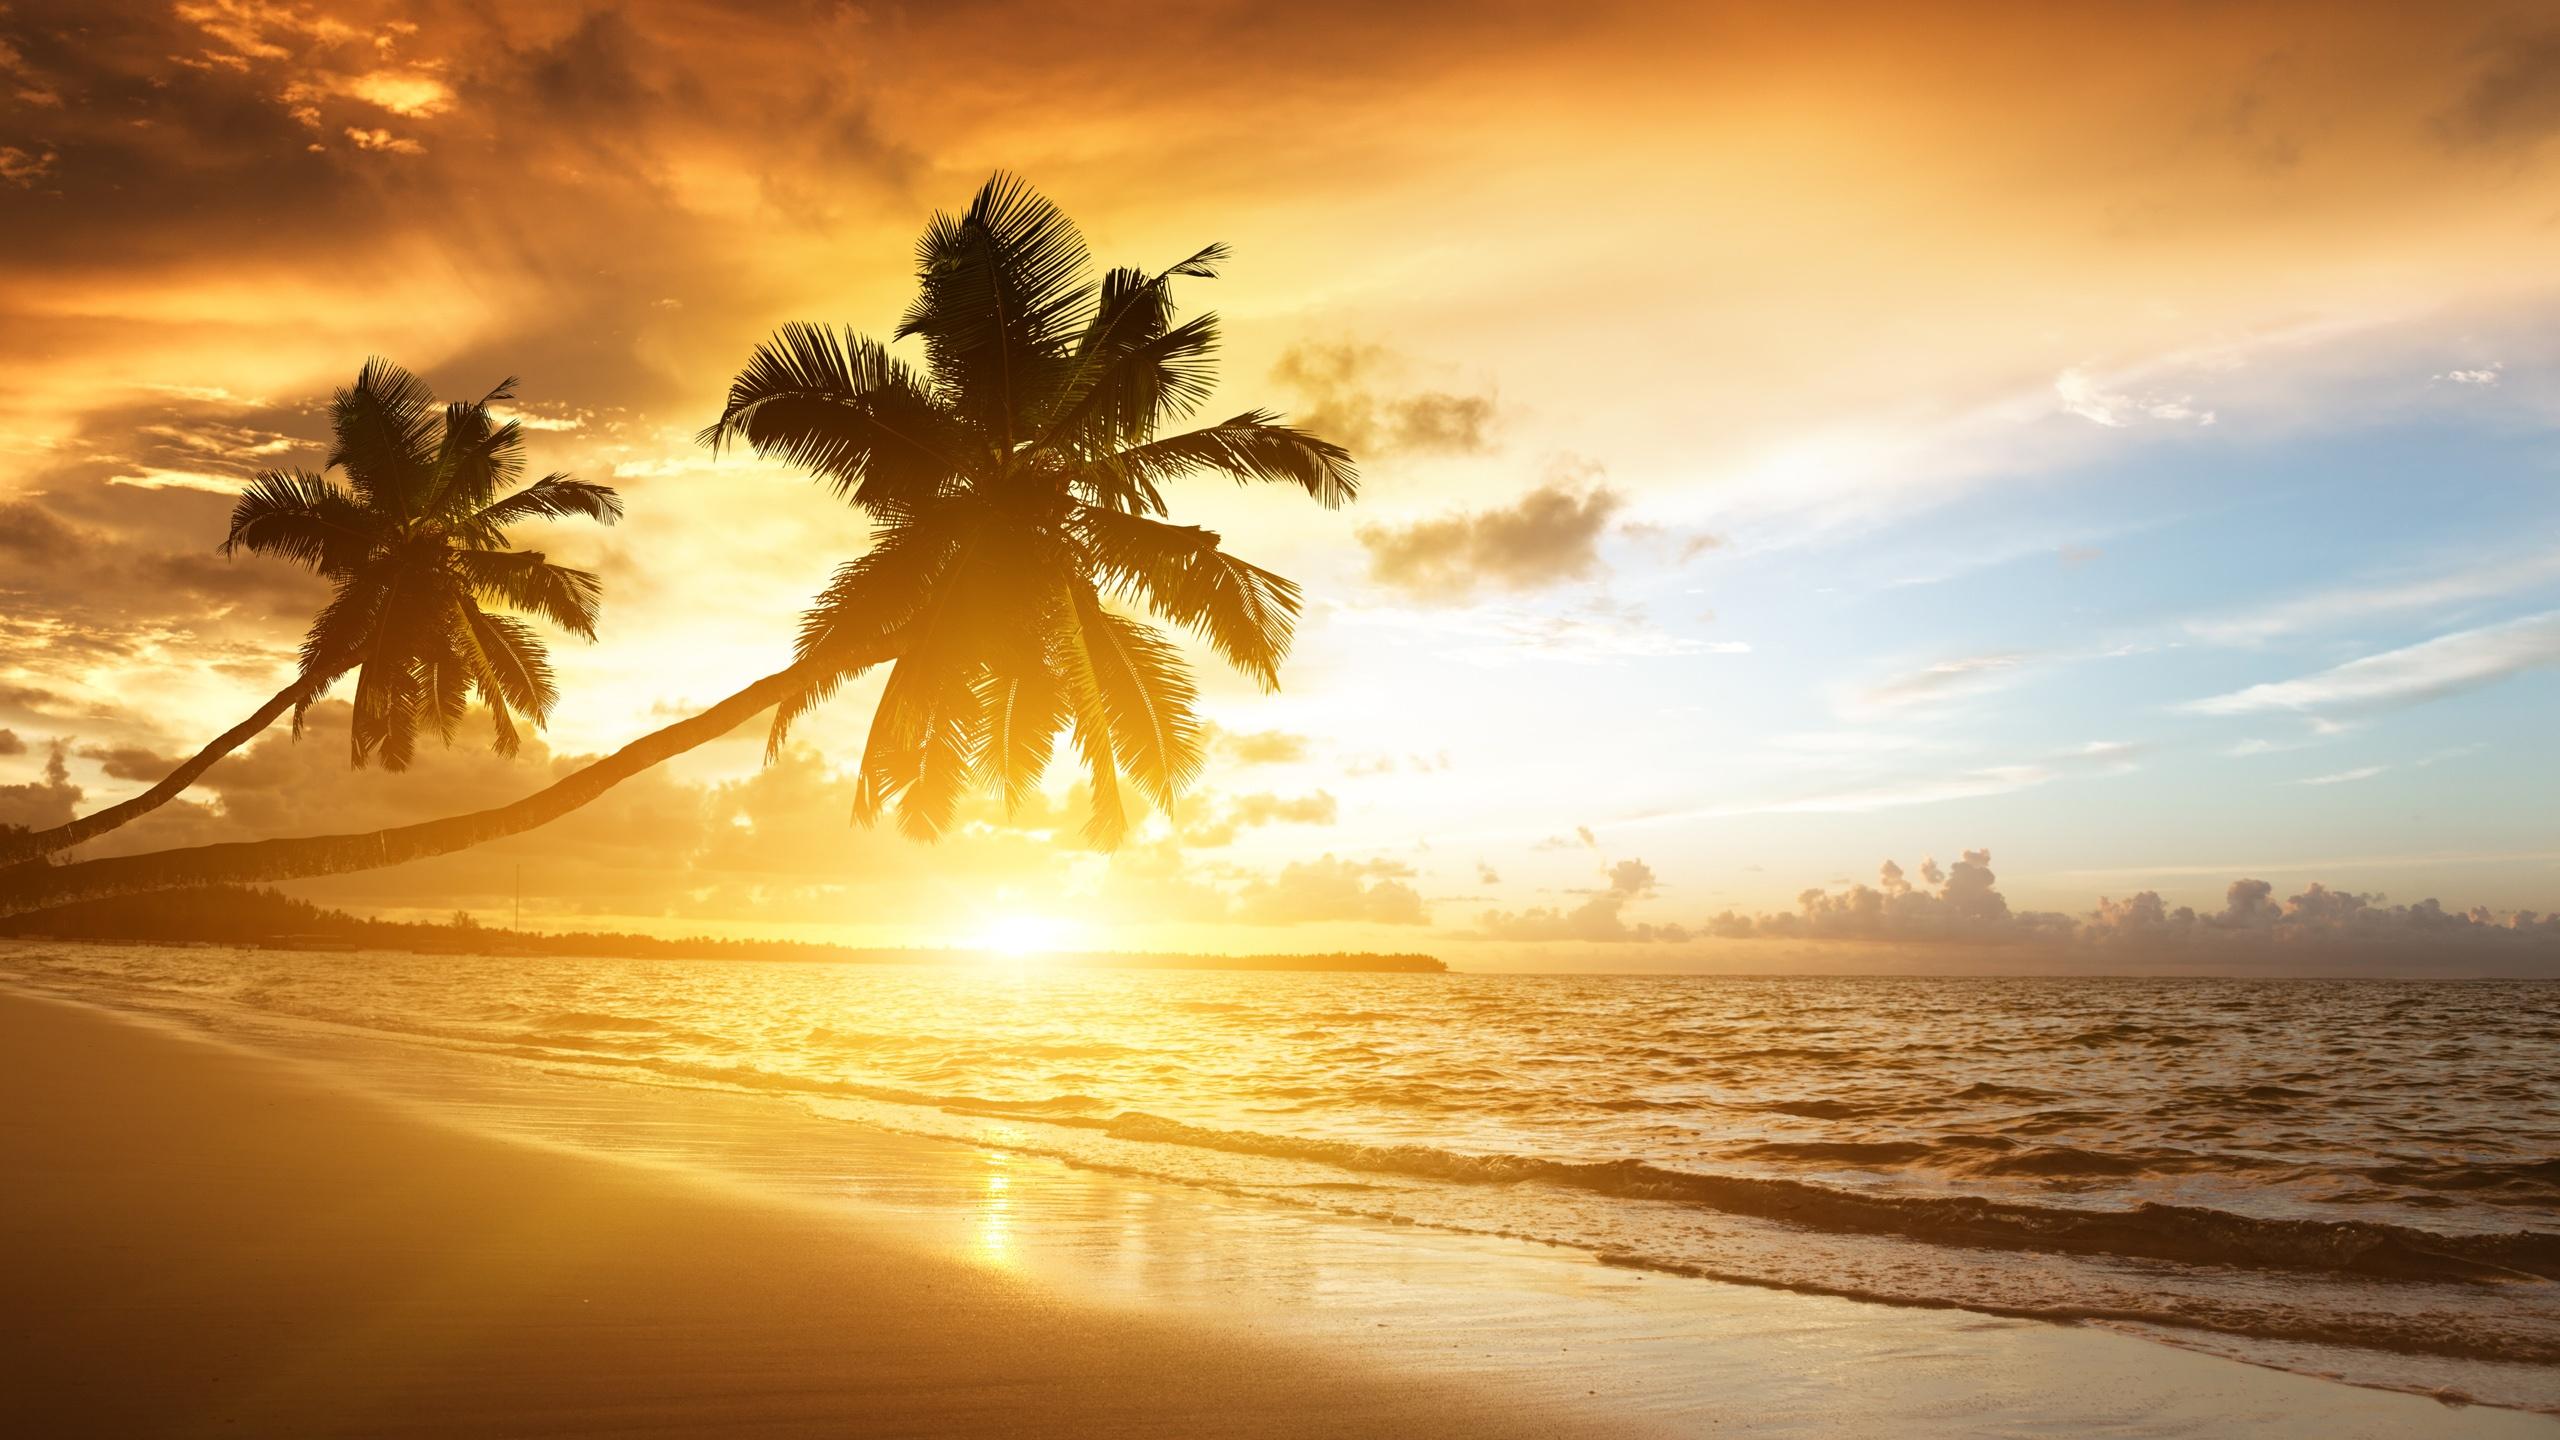 Пальмы, солнце, небо без смс